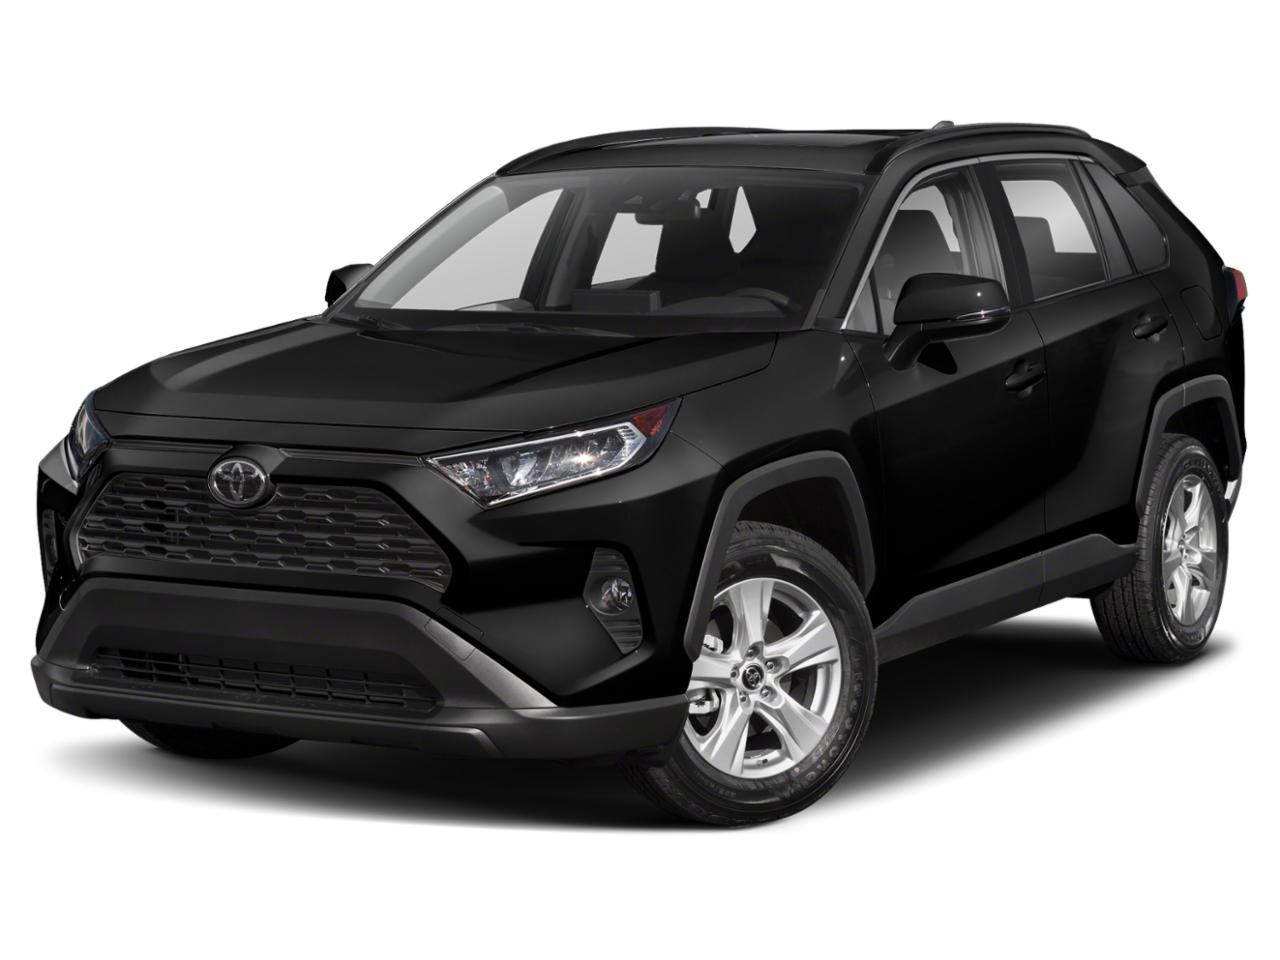 2019 Toyota RAV4 Vehicle Photo in Raton, NM 87740